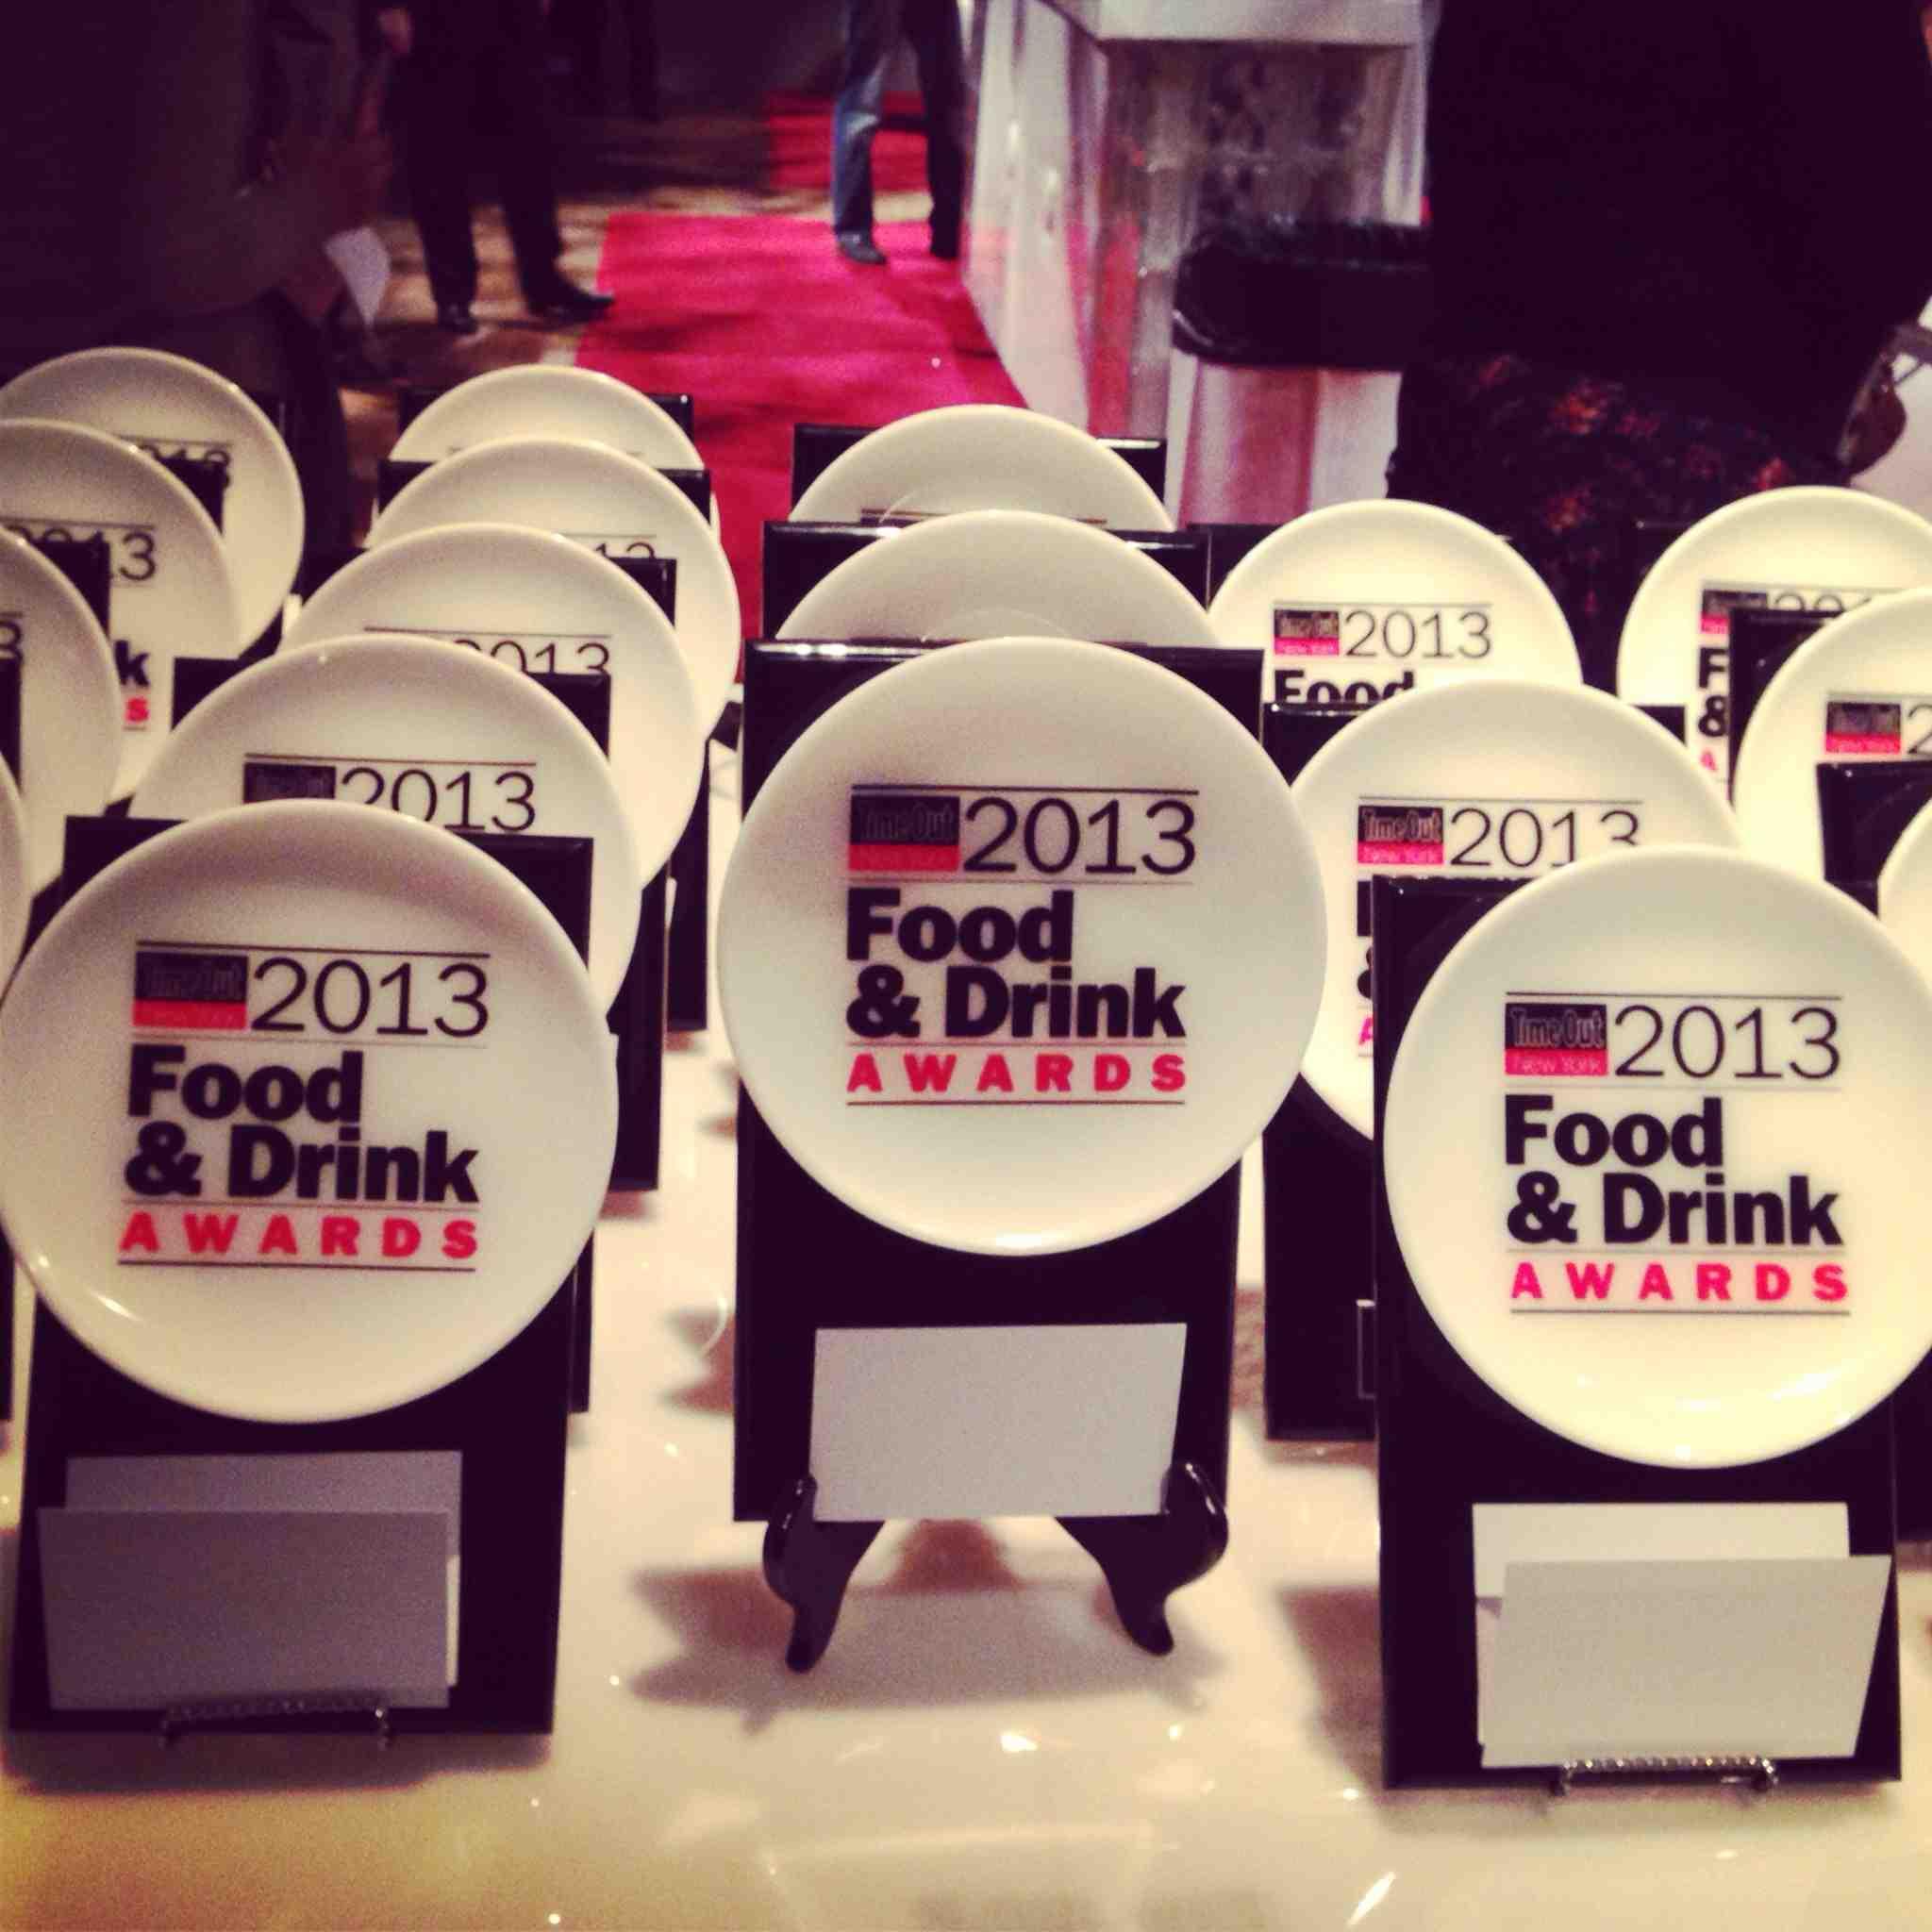 FDA awards ready to hand out